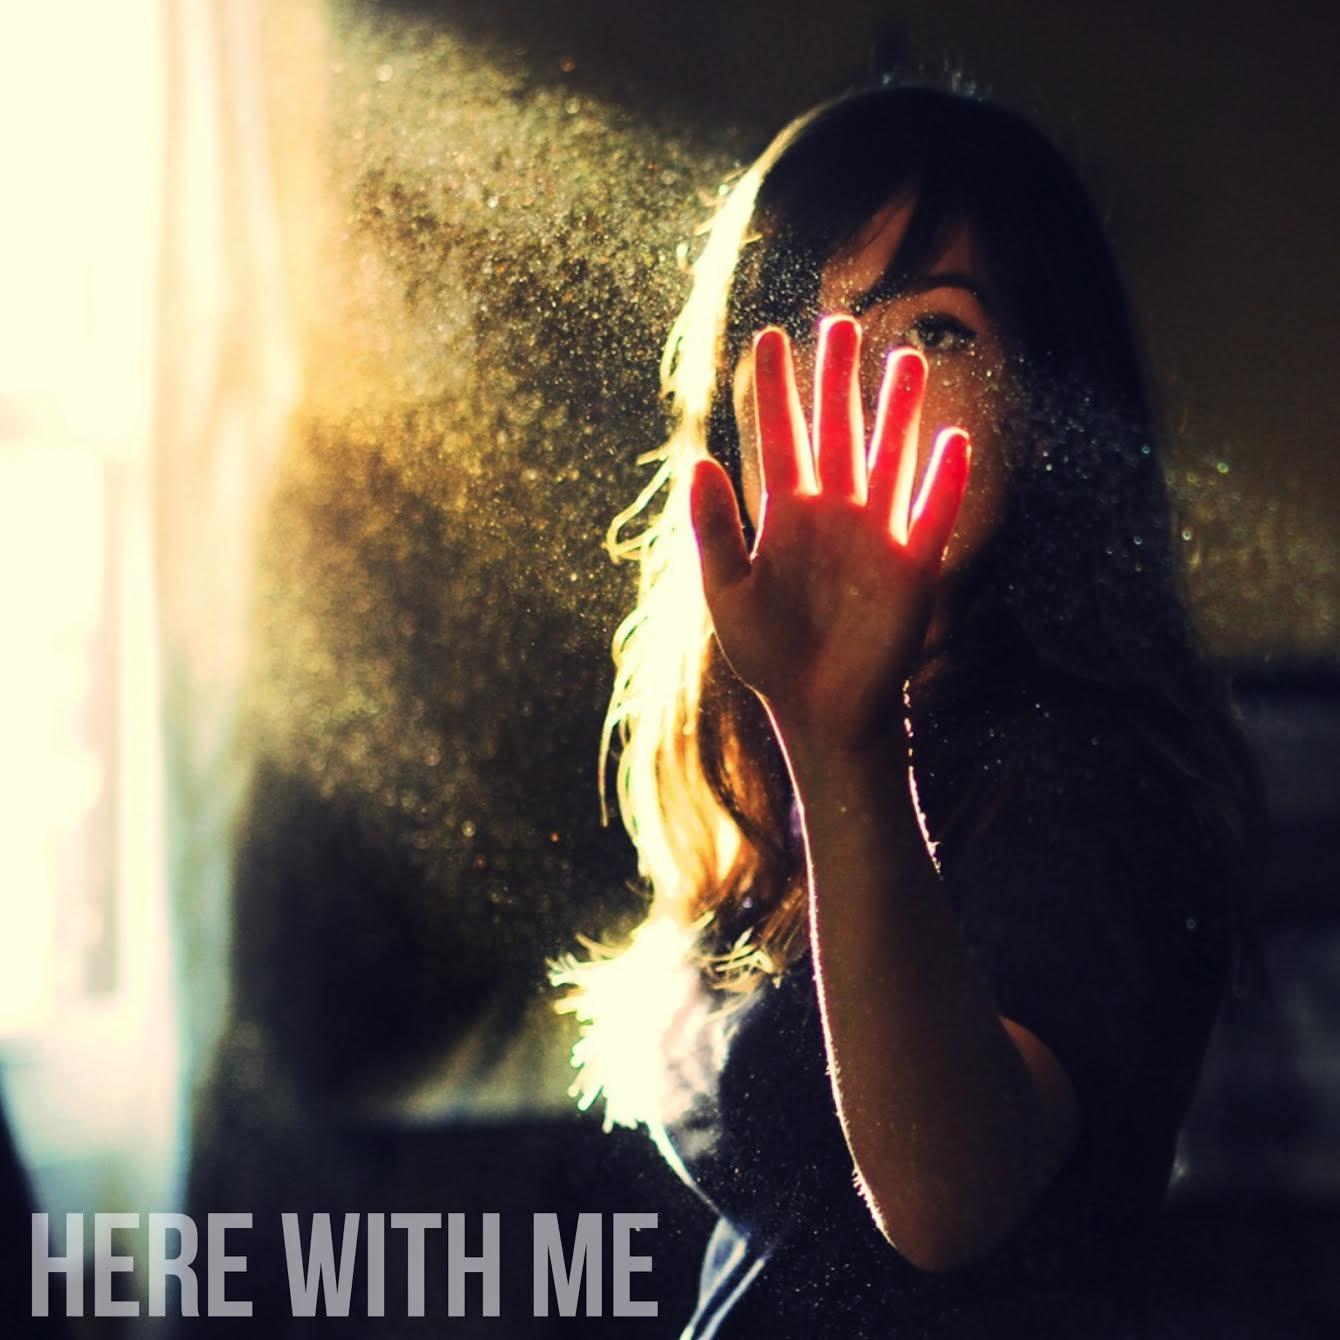 Here With Me - Joe Marson